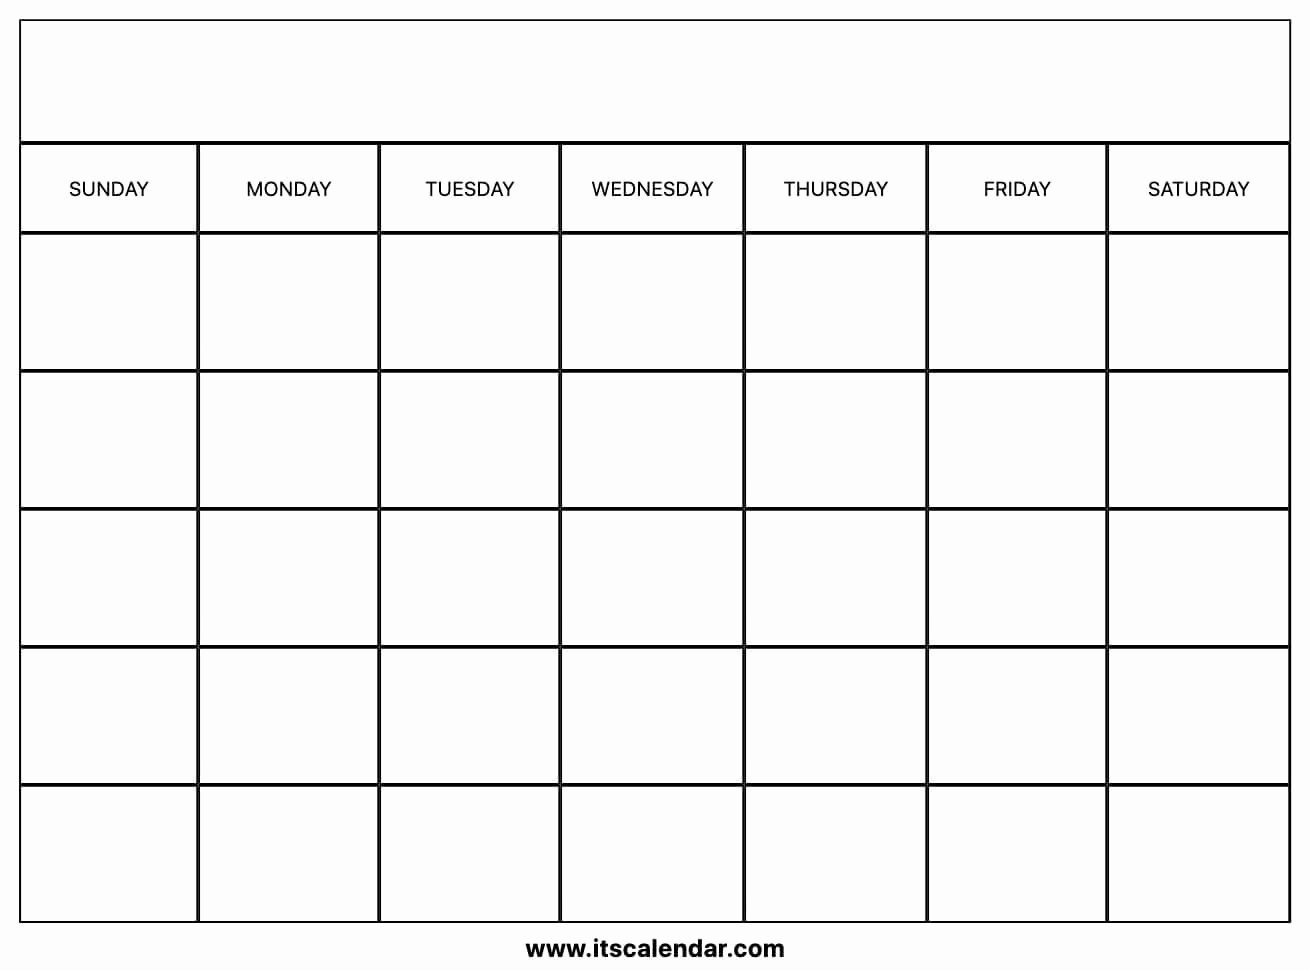 Sunday School Schedule Template Lovely Printable Blank Calendar